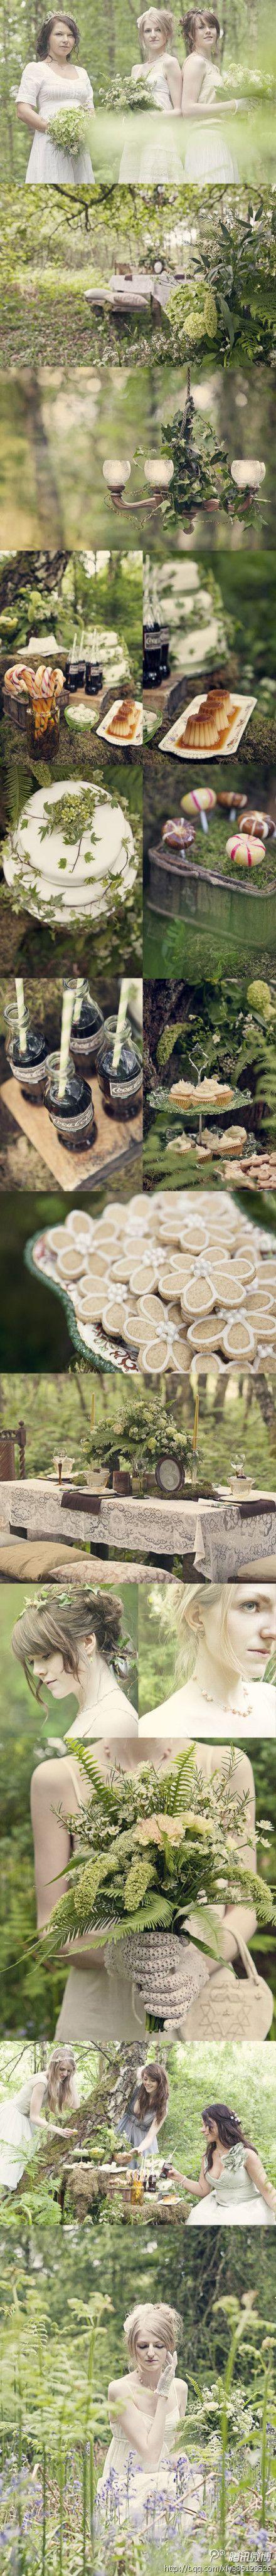 Share a forest department of wedding arrangement, return uncut jade to return true pure, like clean natural ~